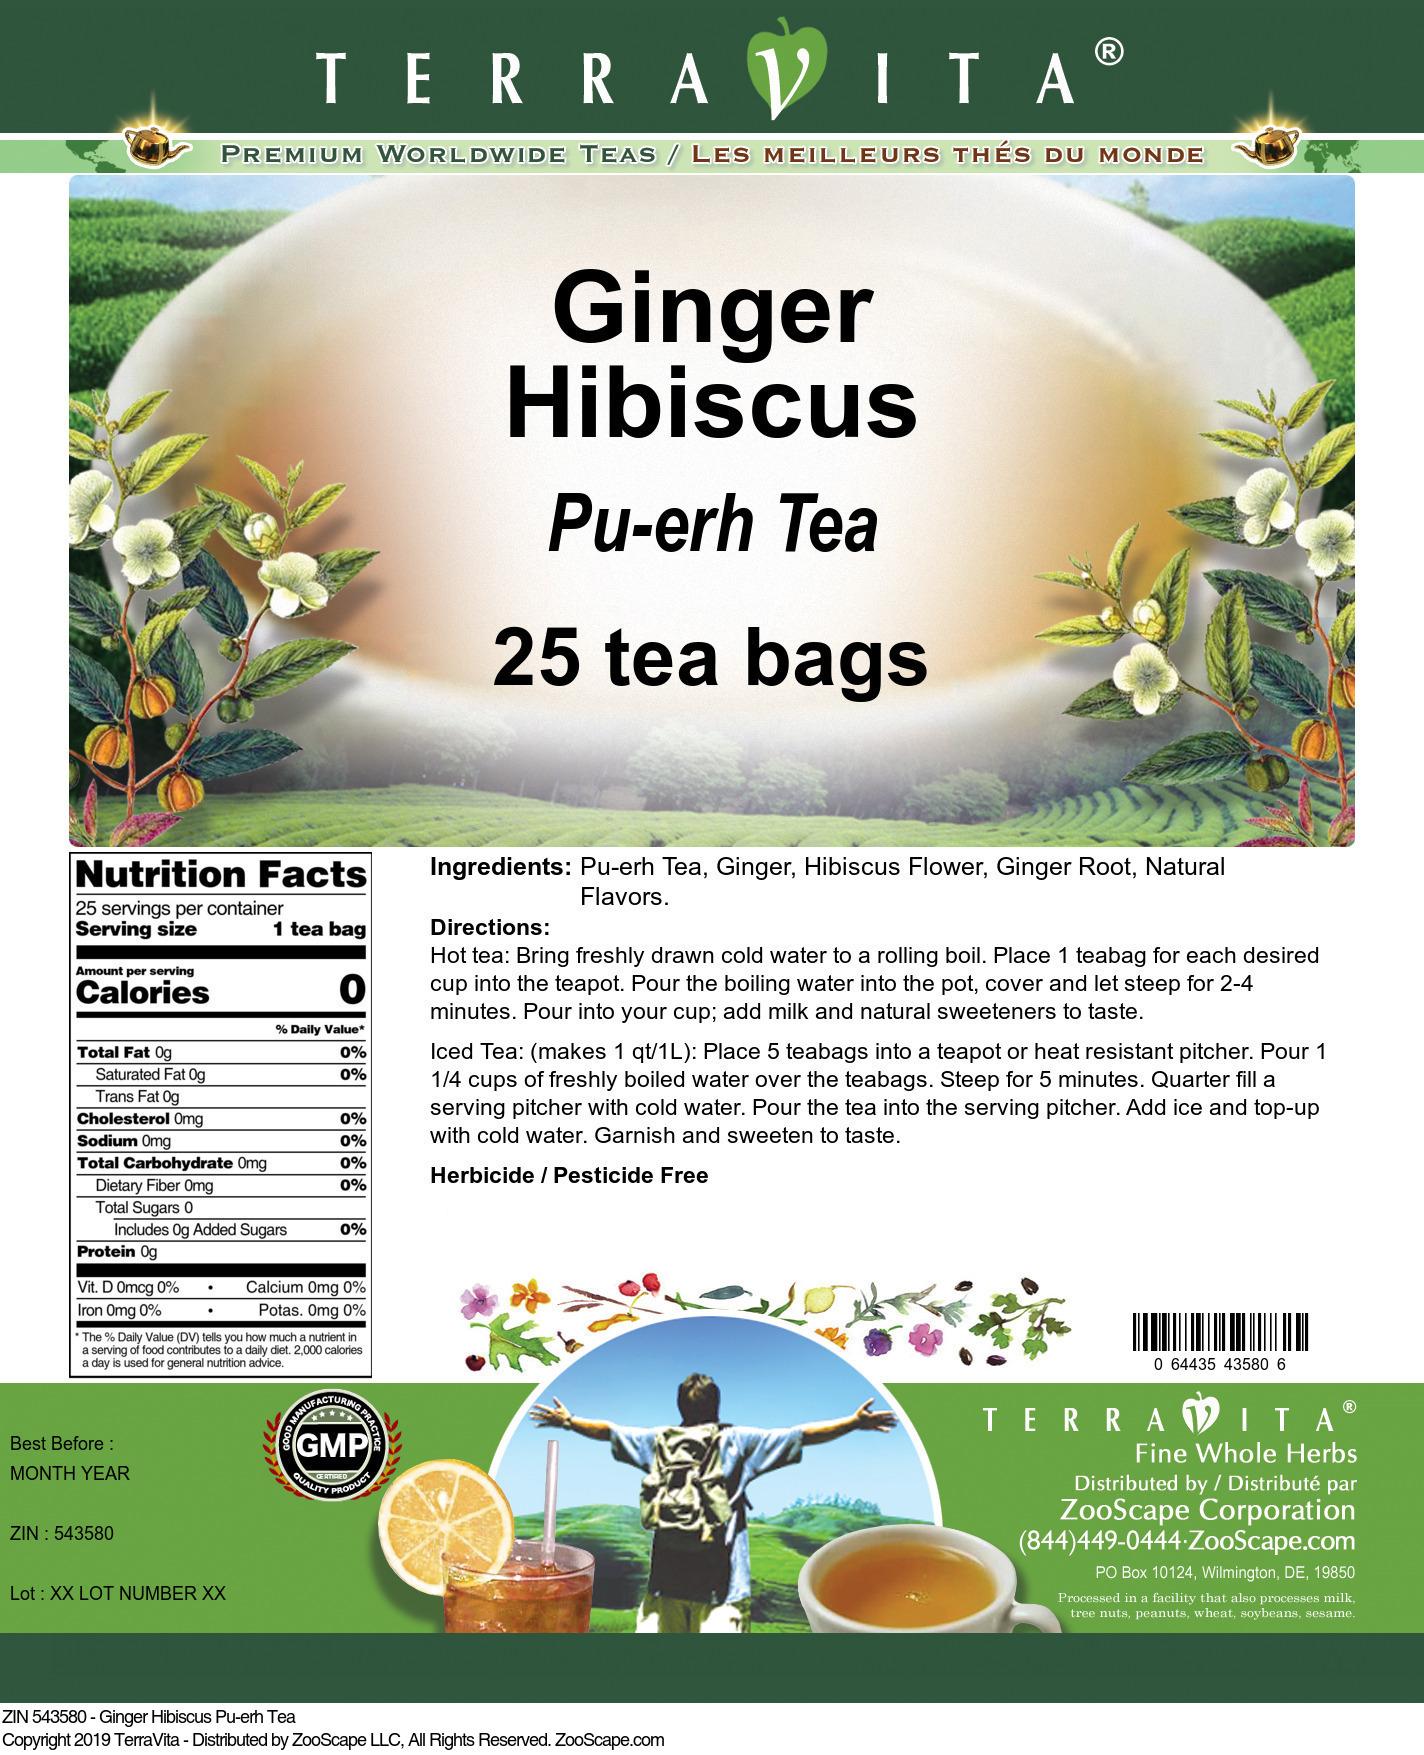 Ginger Hibiscus Pu-erh Tea